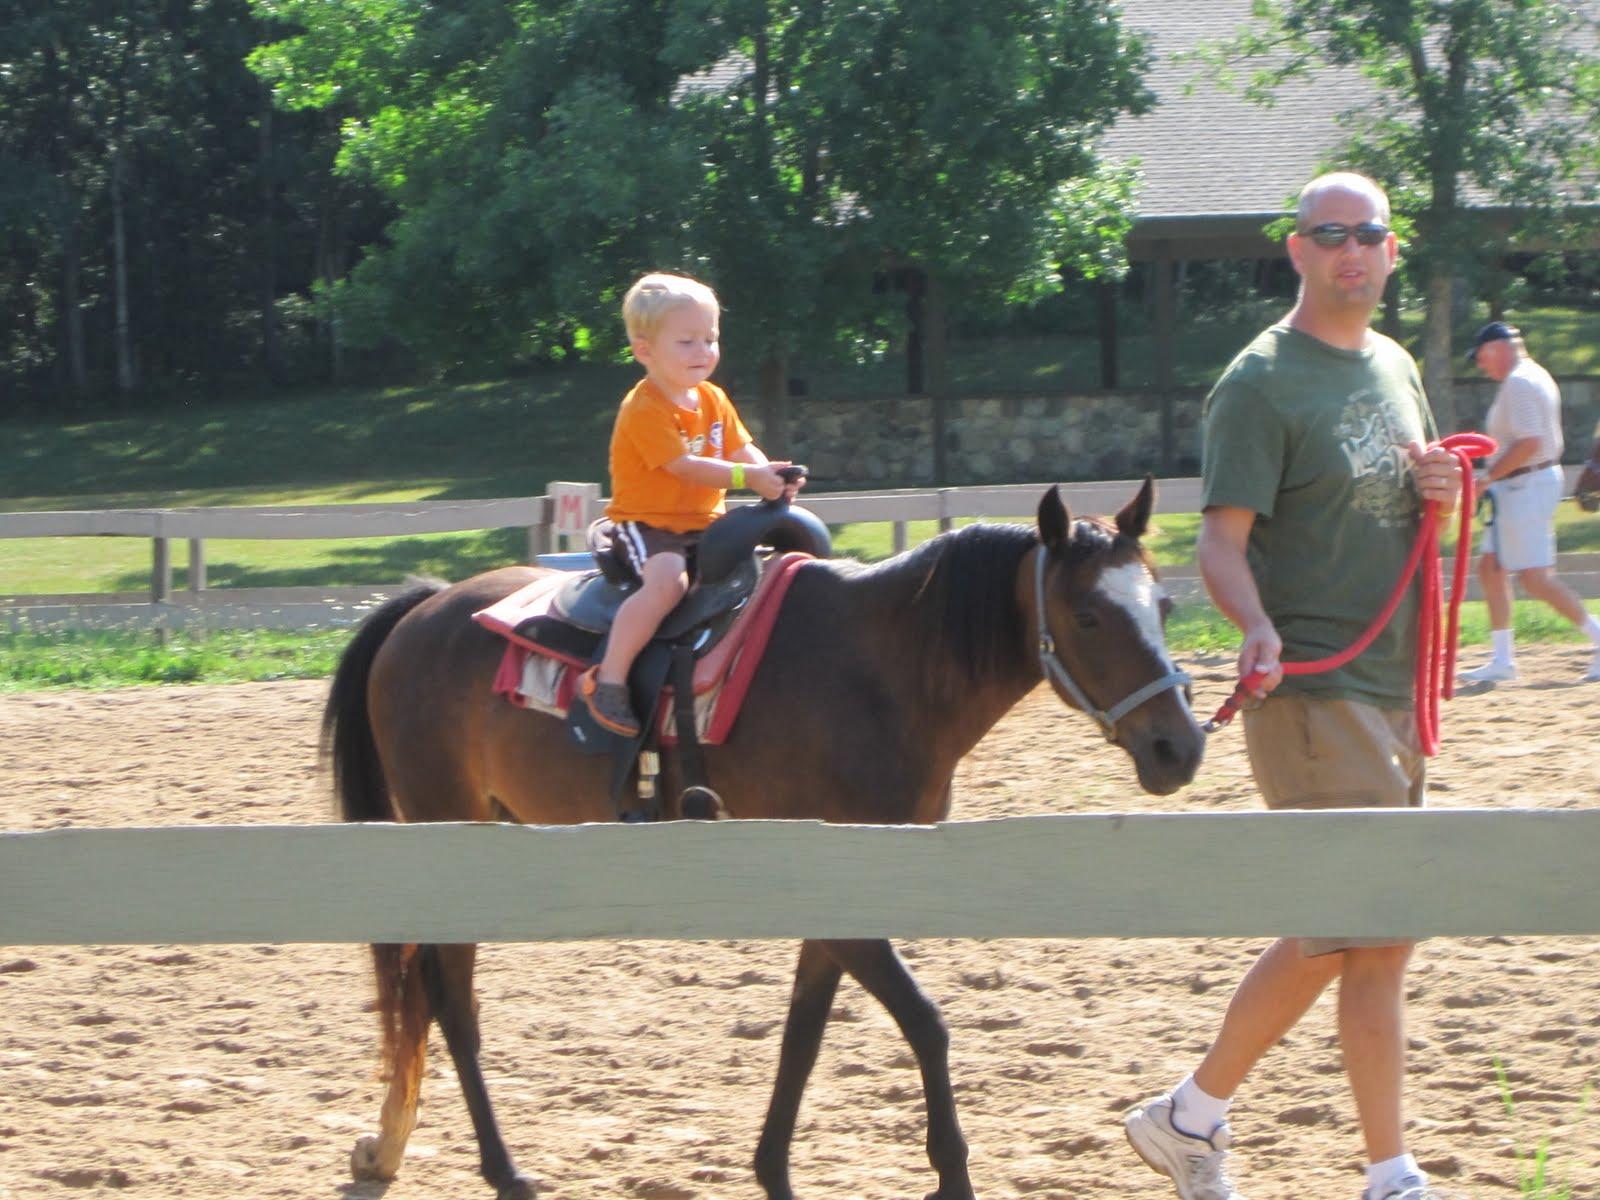 matthew liked his pony ride